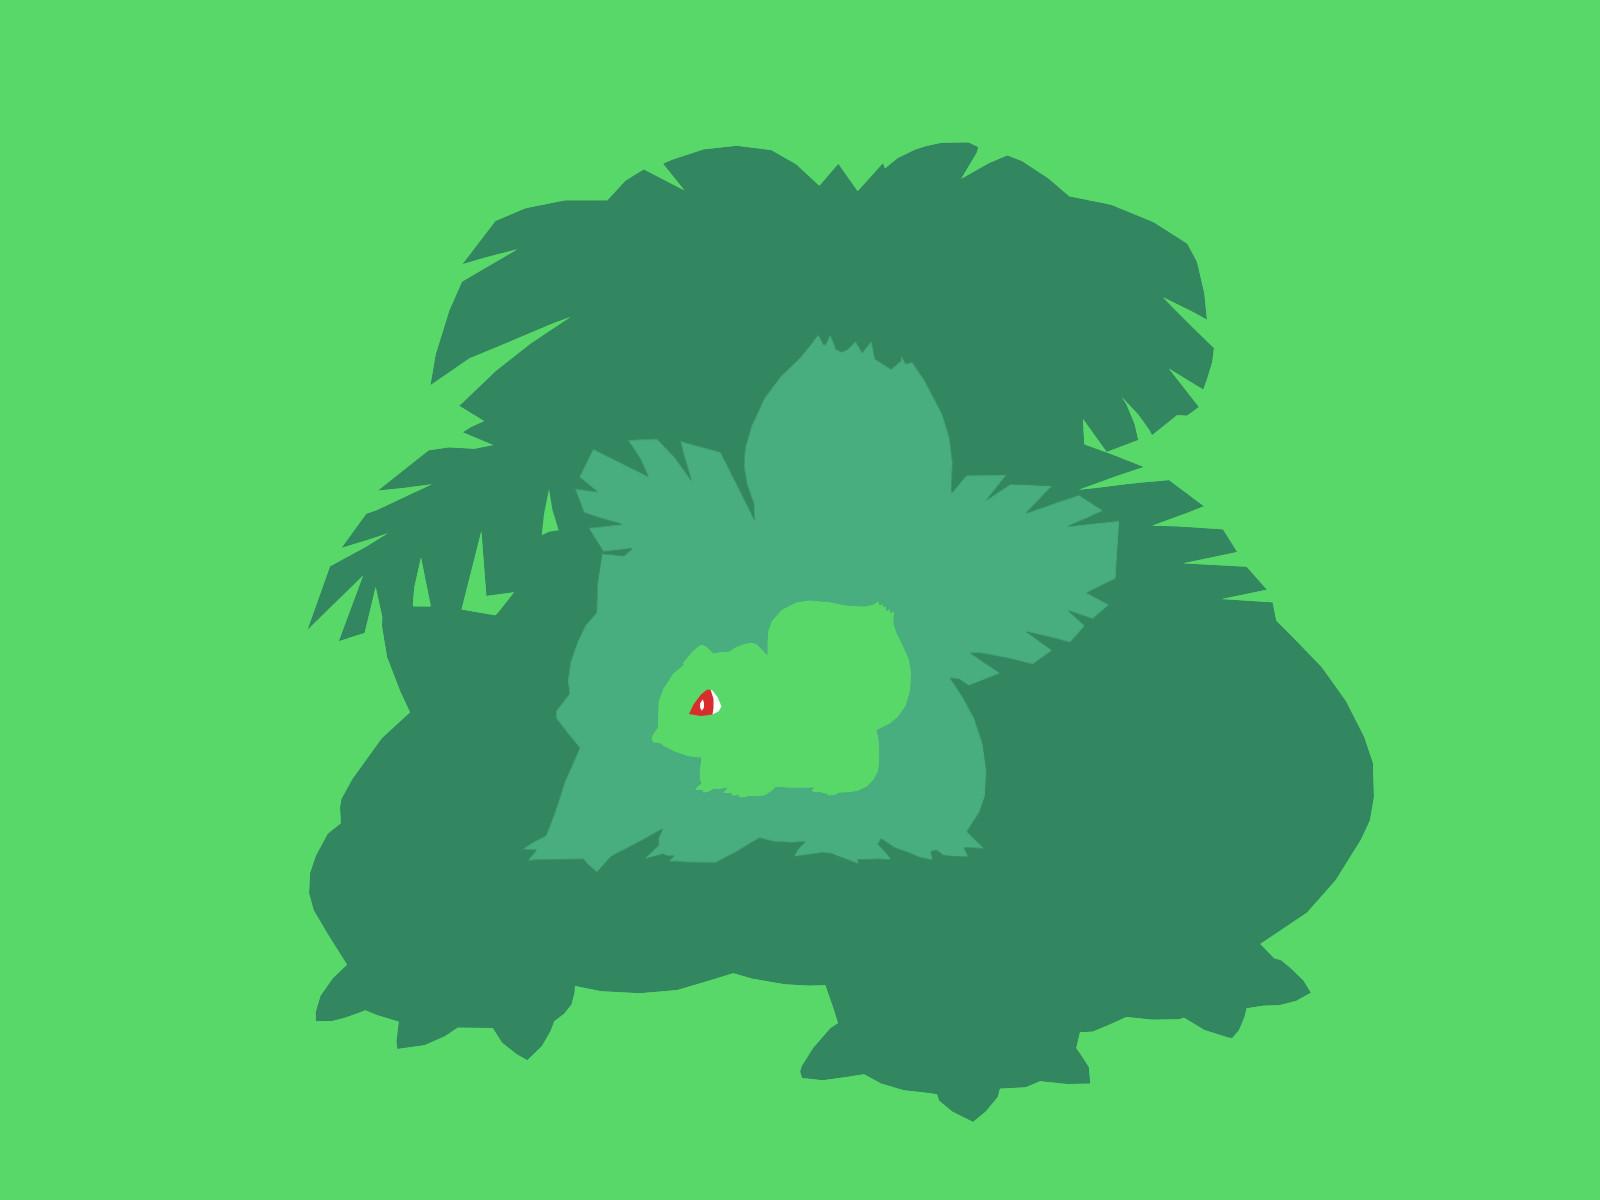 bulbasaur evolution wallpaper images -#main